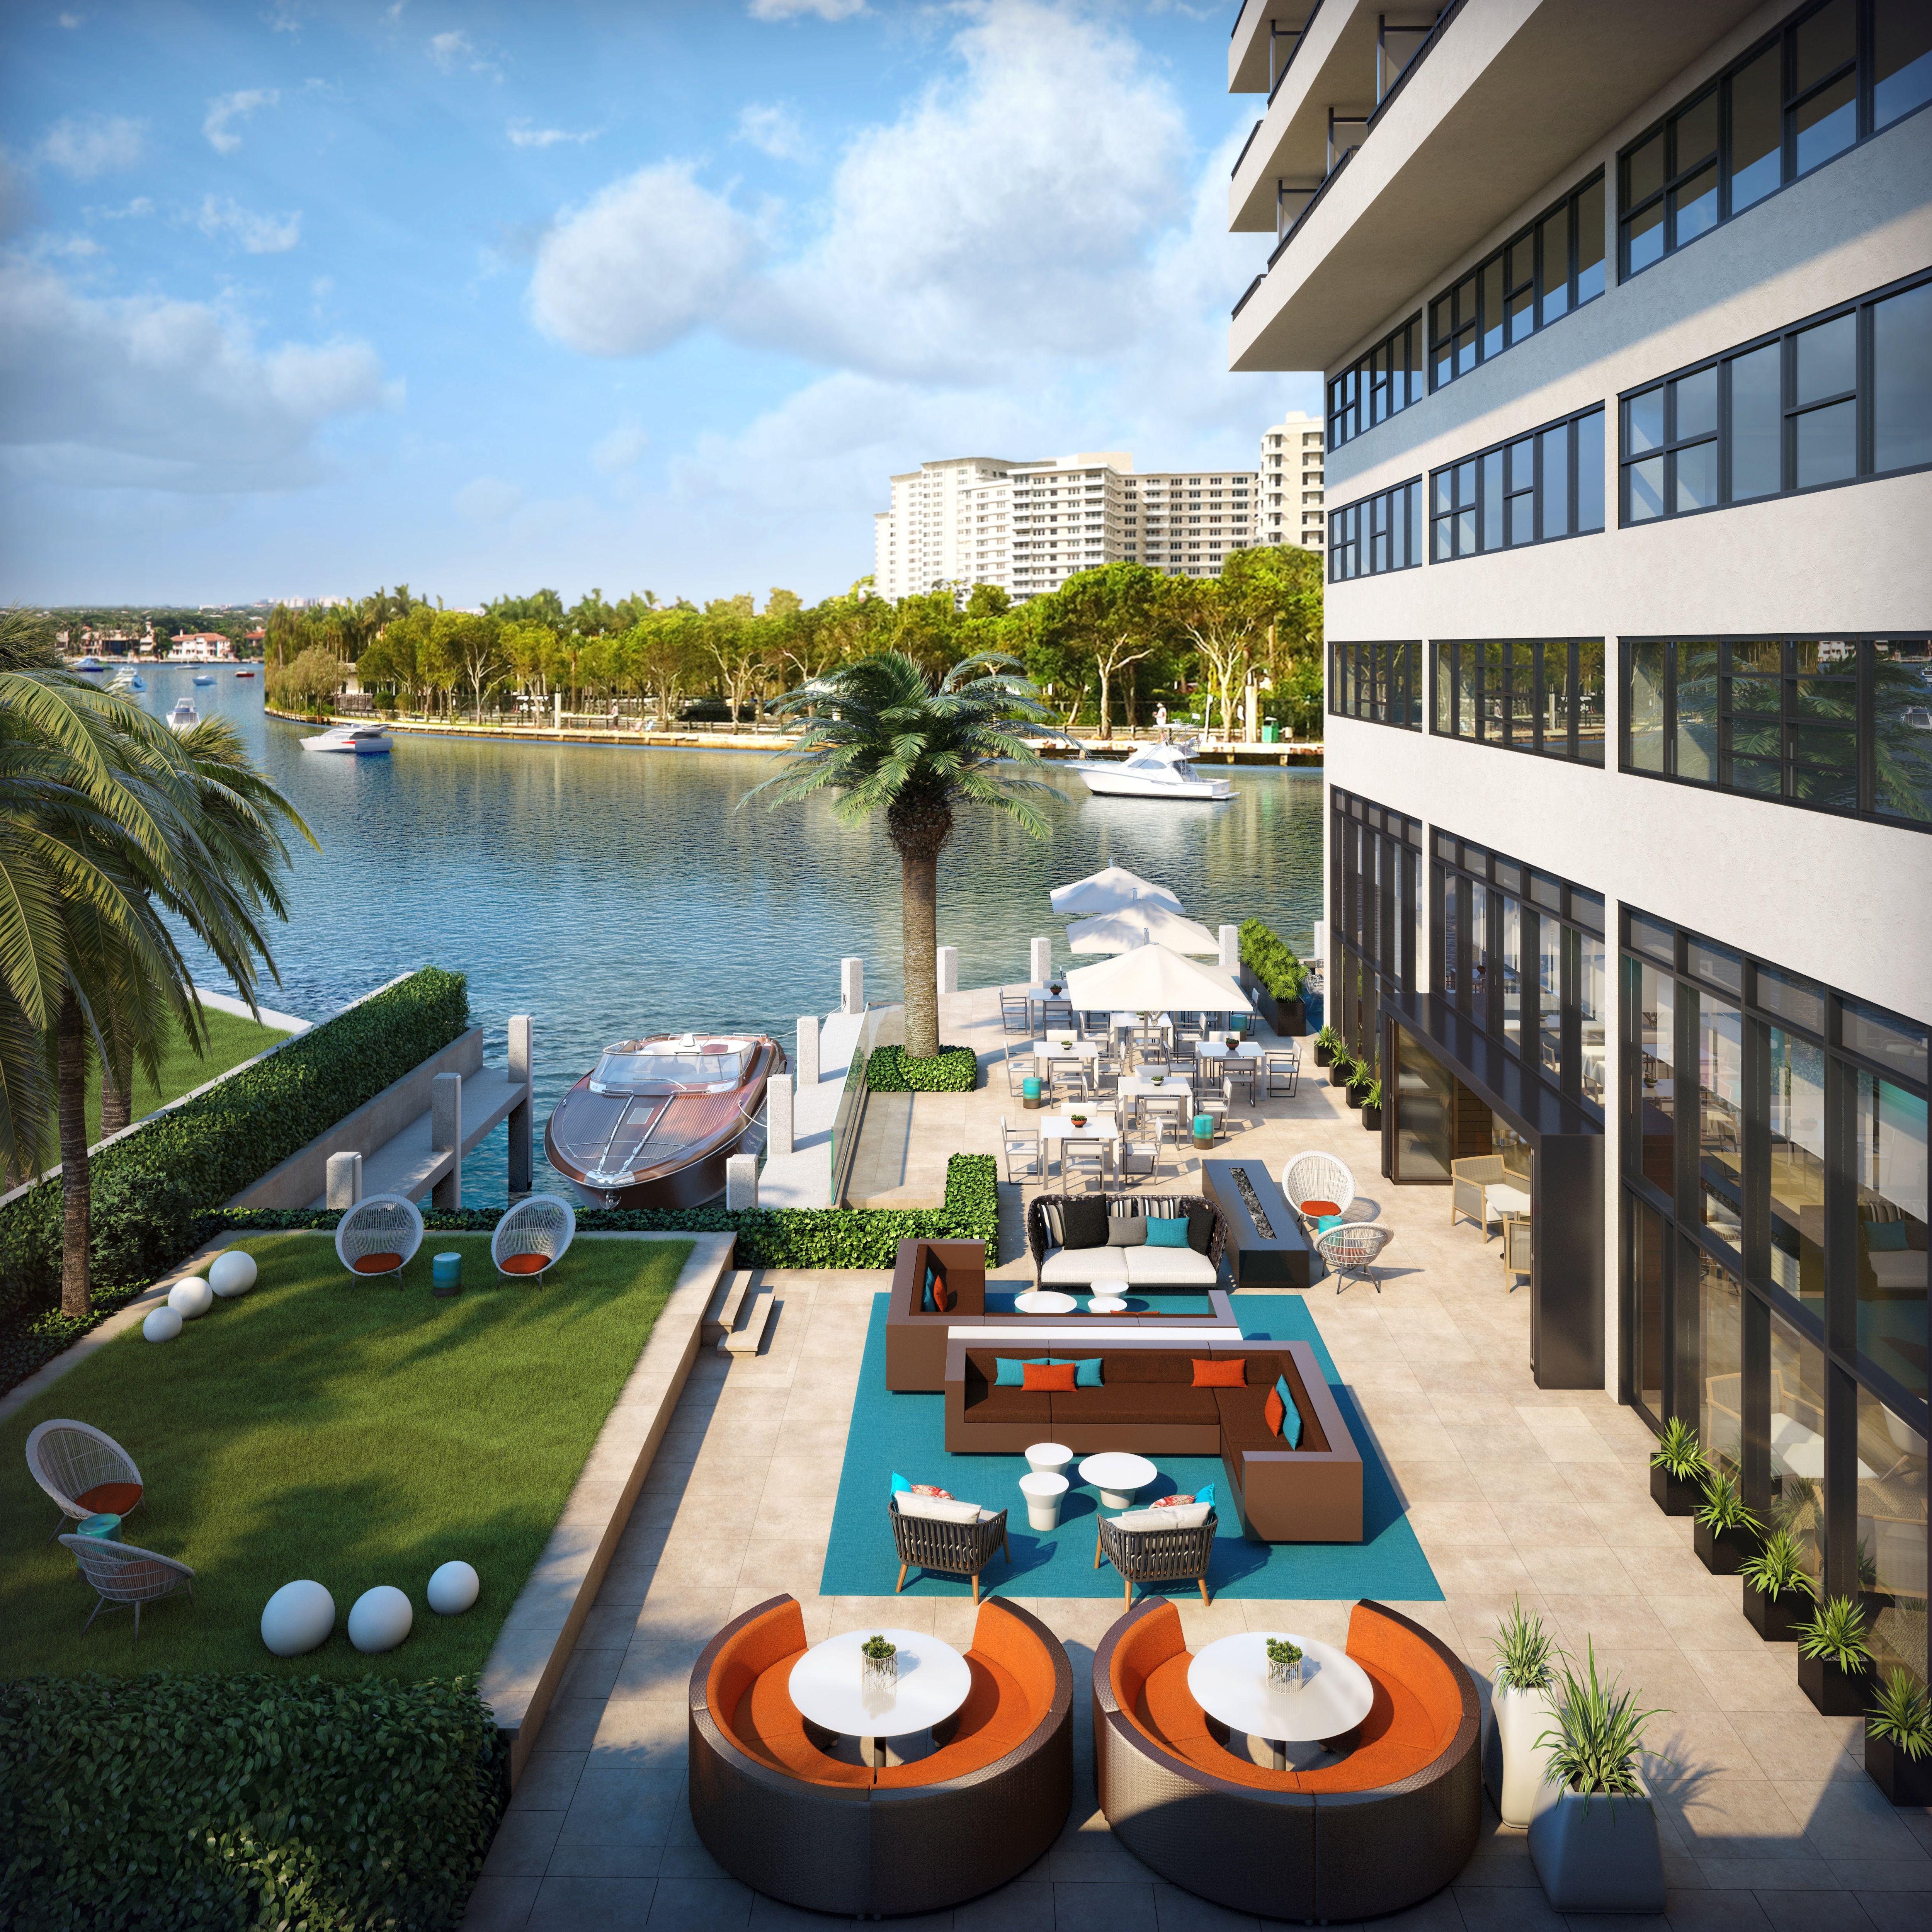 The Promenade Lawn At Waterstone Resort & Marina